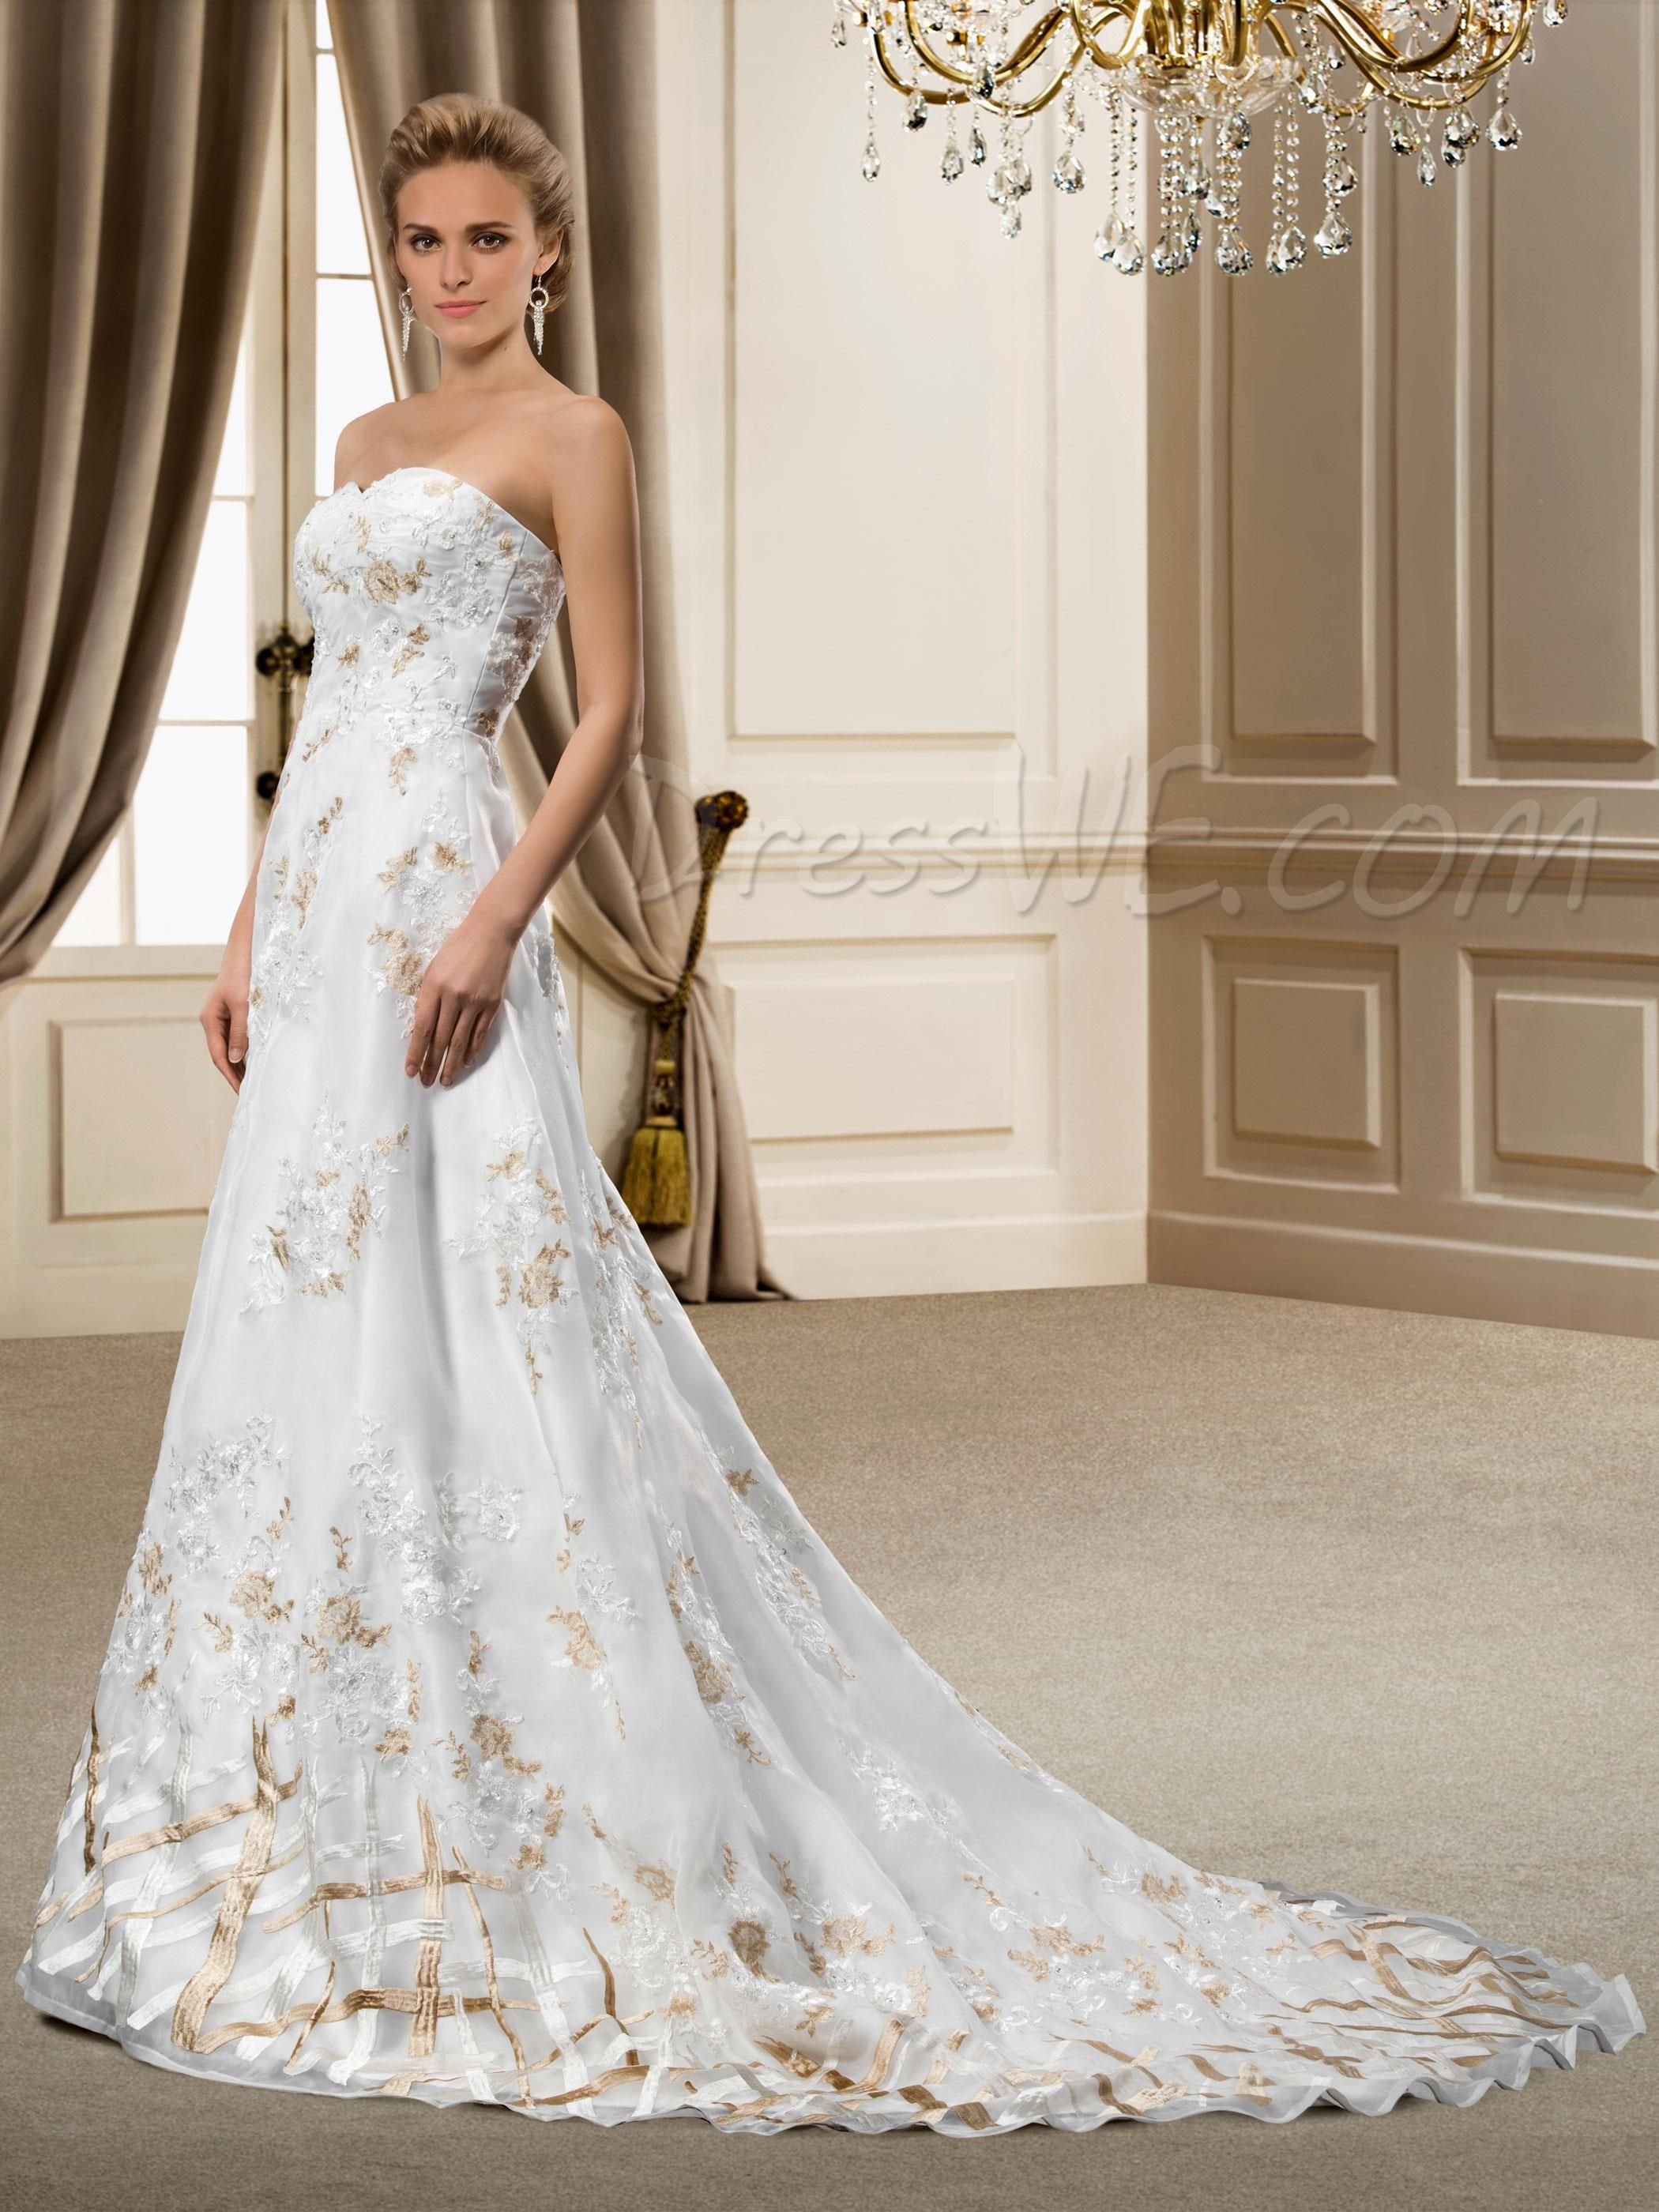 Modest wedding dresses under 200   Dresswe SUPPLIES Appealing Sweetheart Court Train